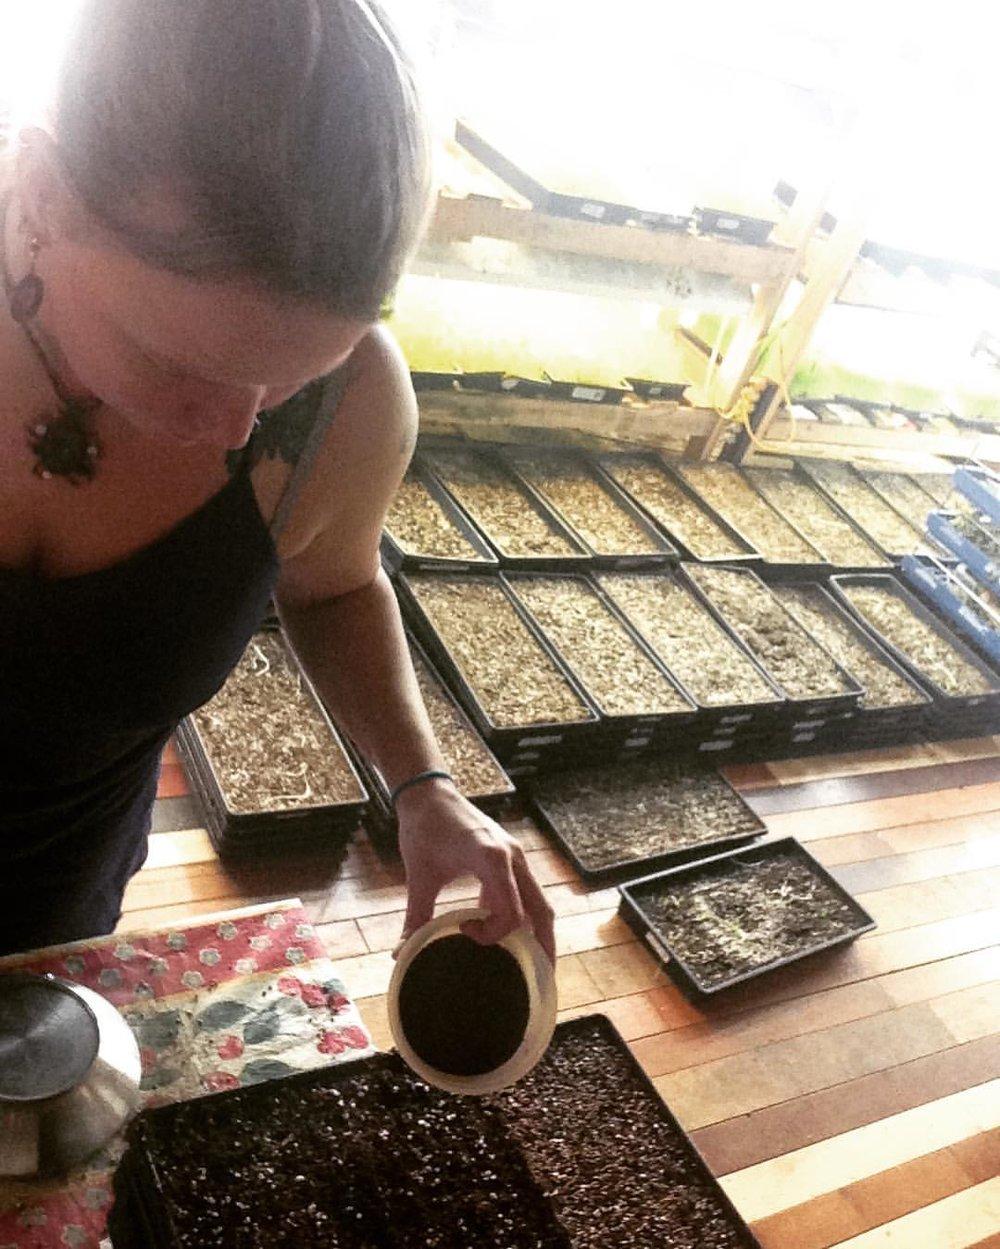 microgreens planting urban farming